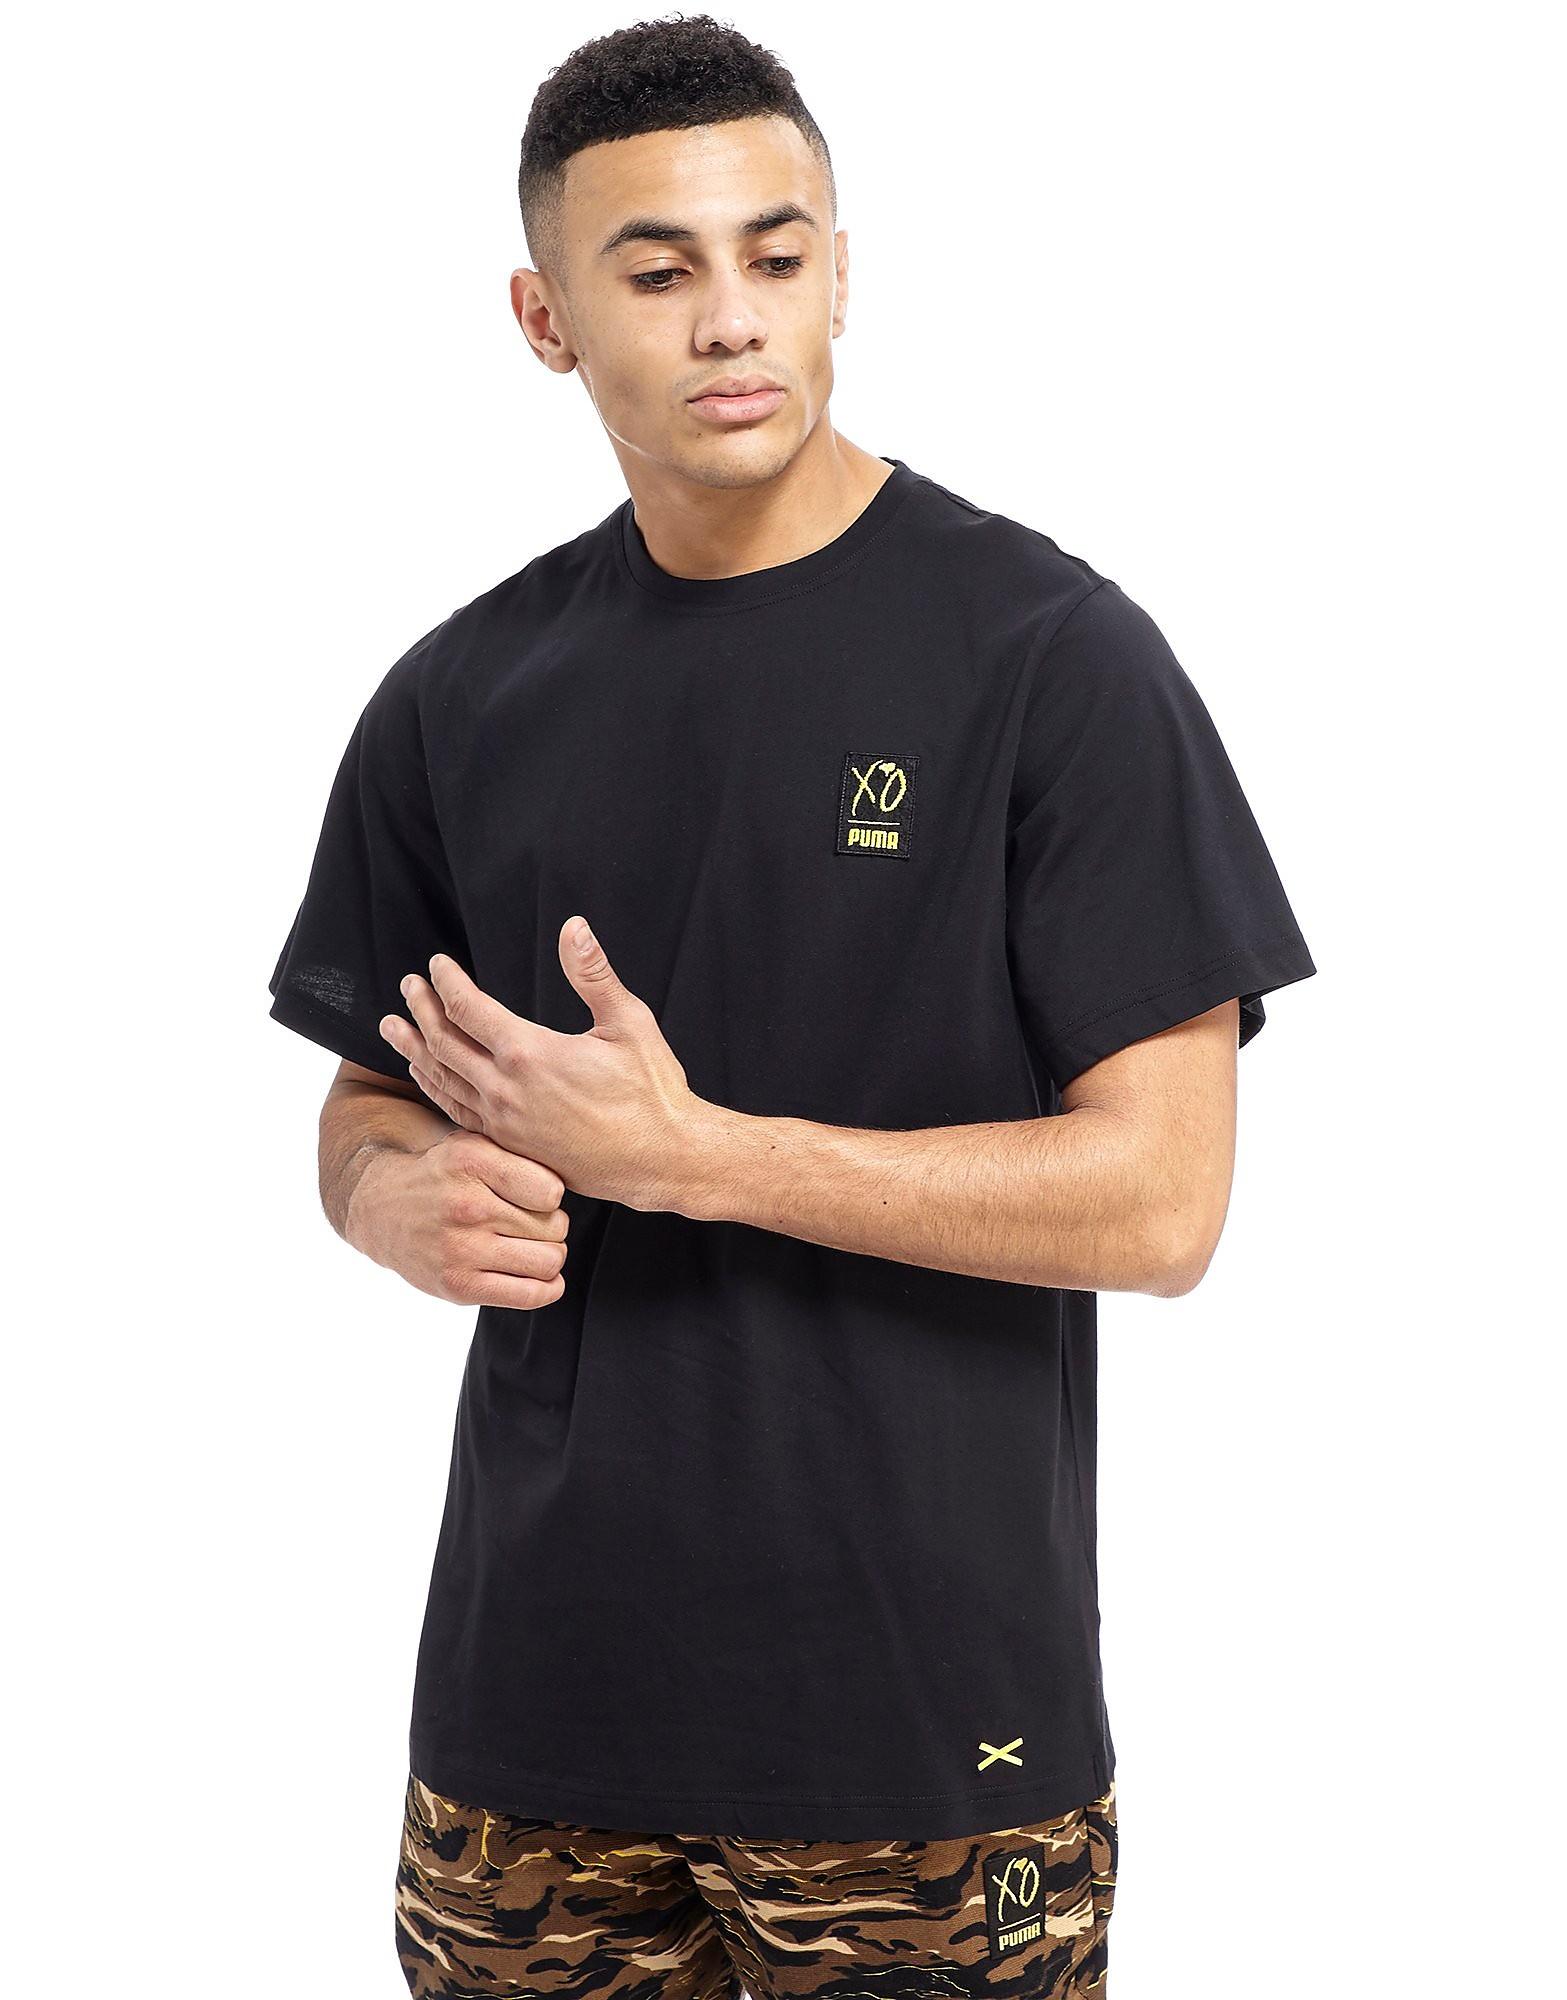 PUMA XO T-Shirt